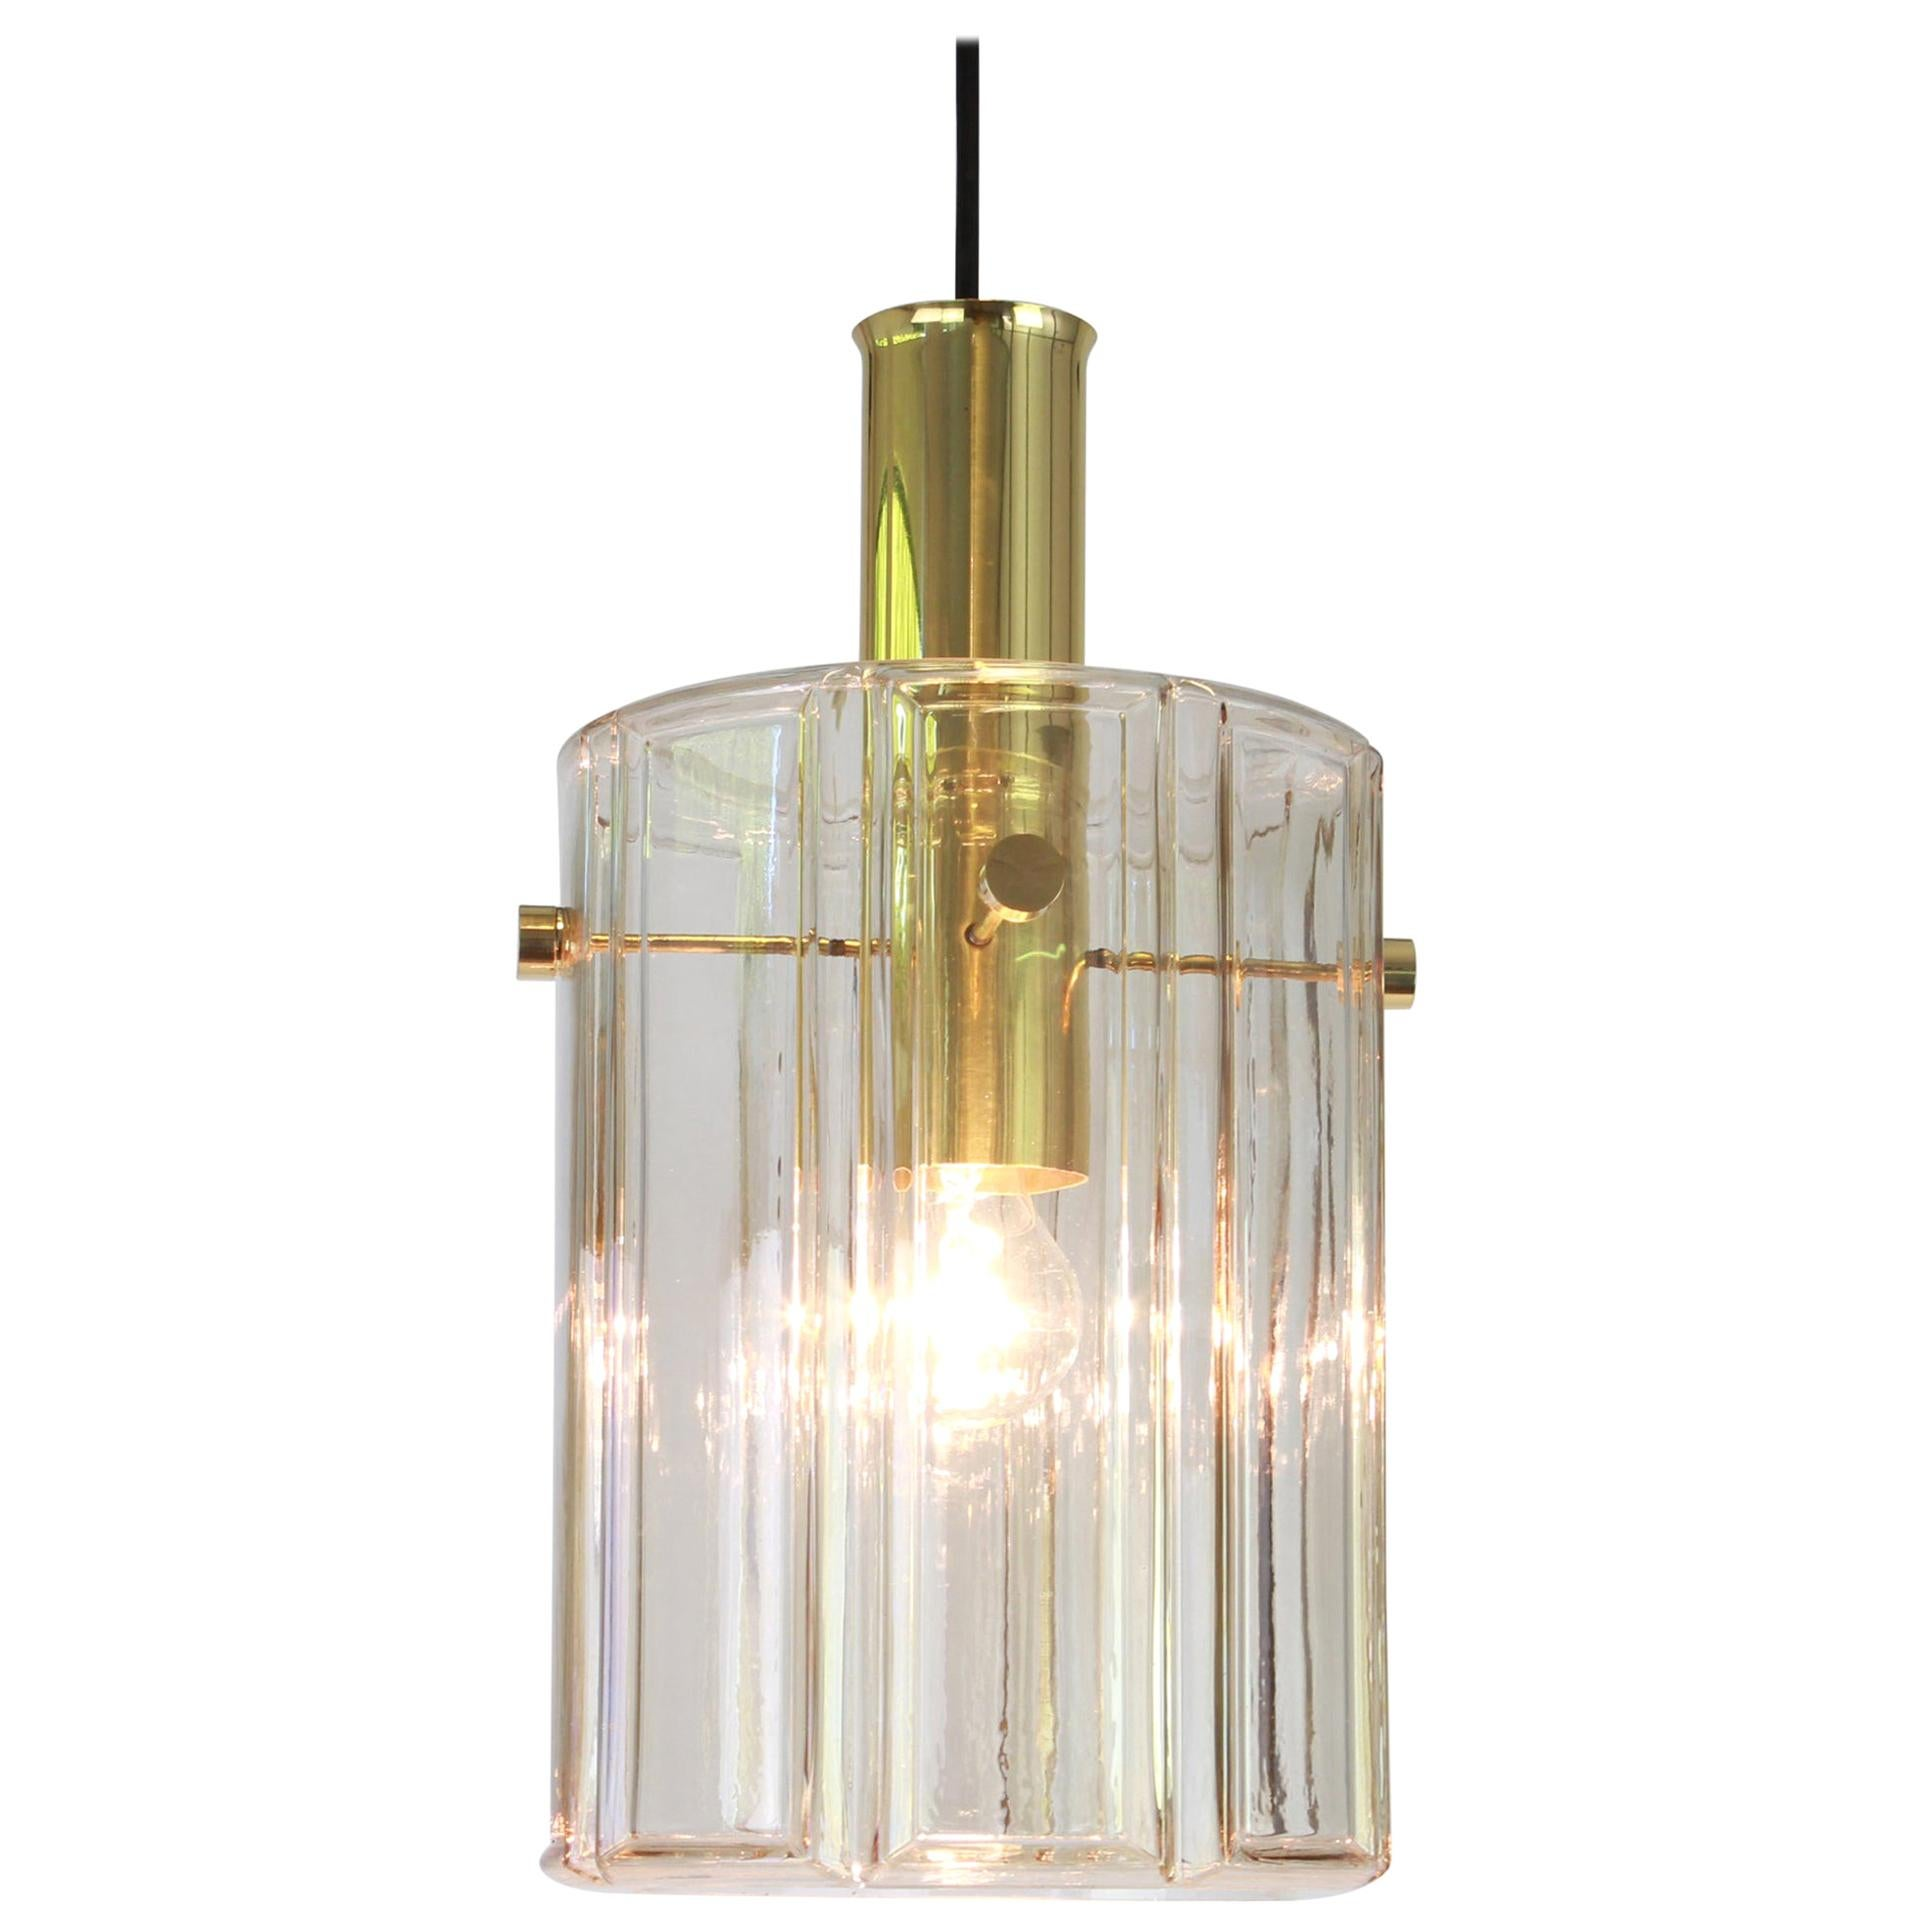 Large Lantern Form Pendant Cylindrical Glass Shade by Limburg, Germany, 1960s